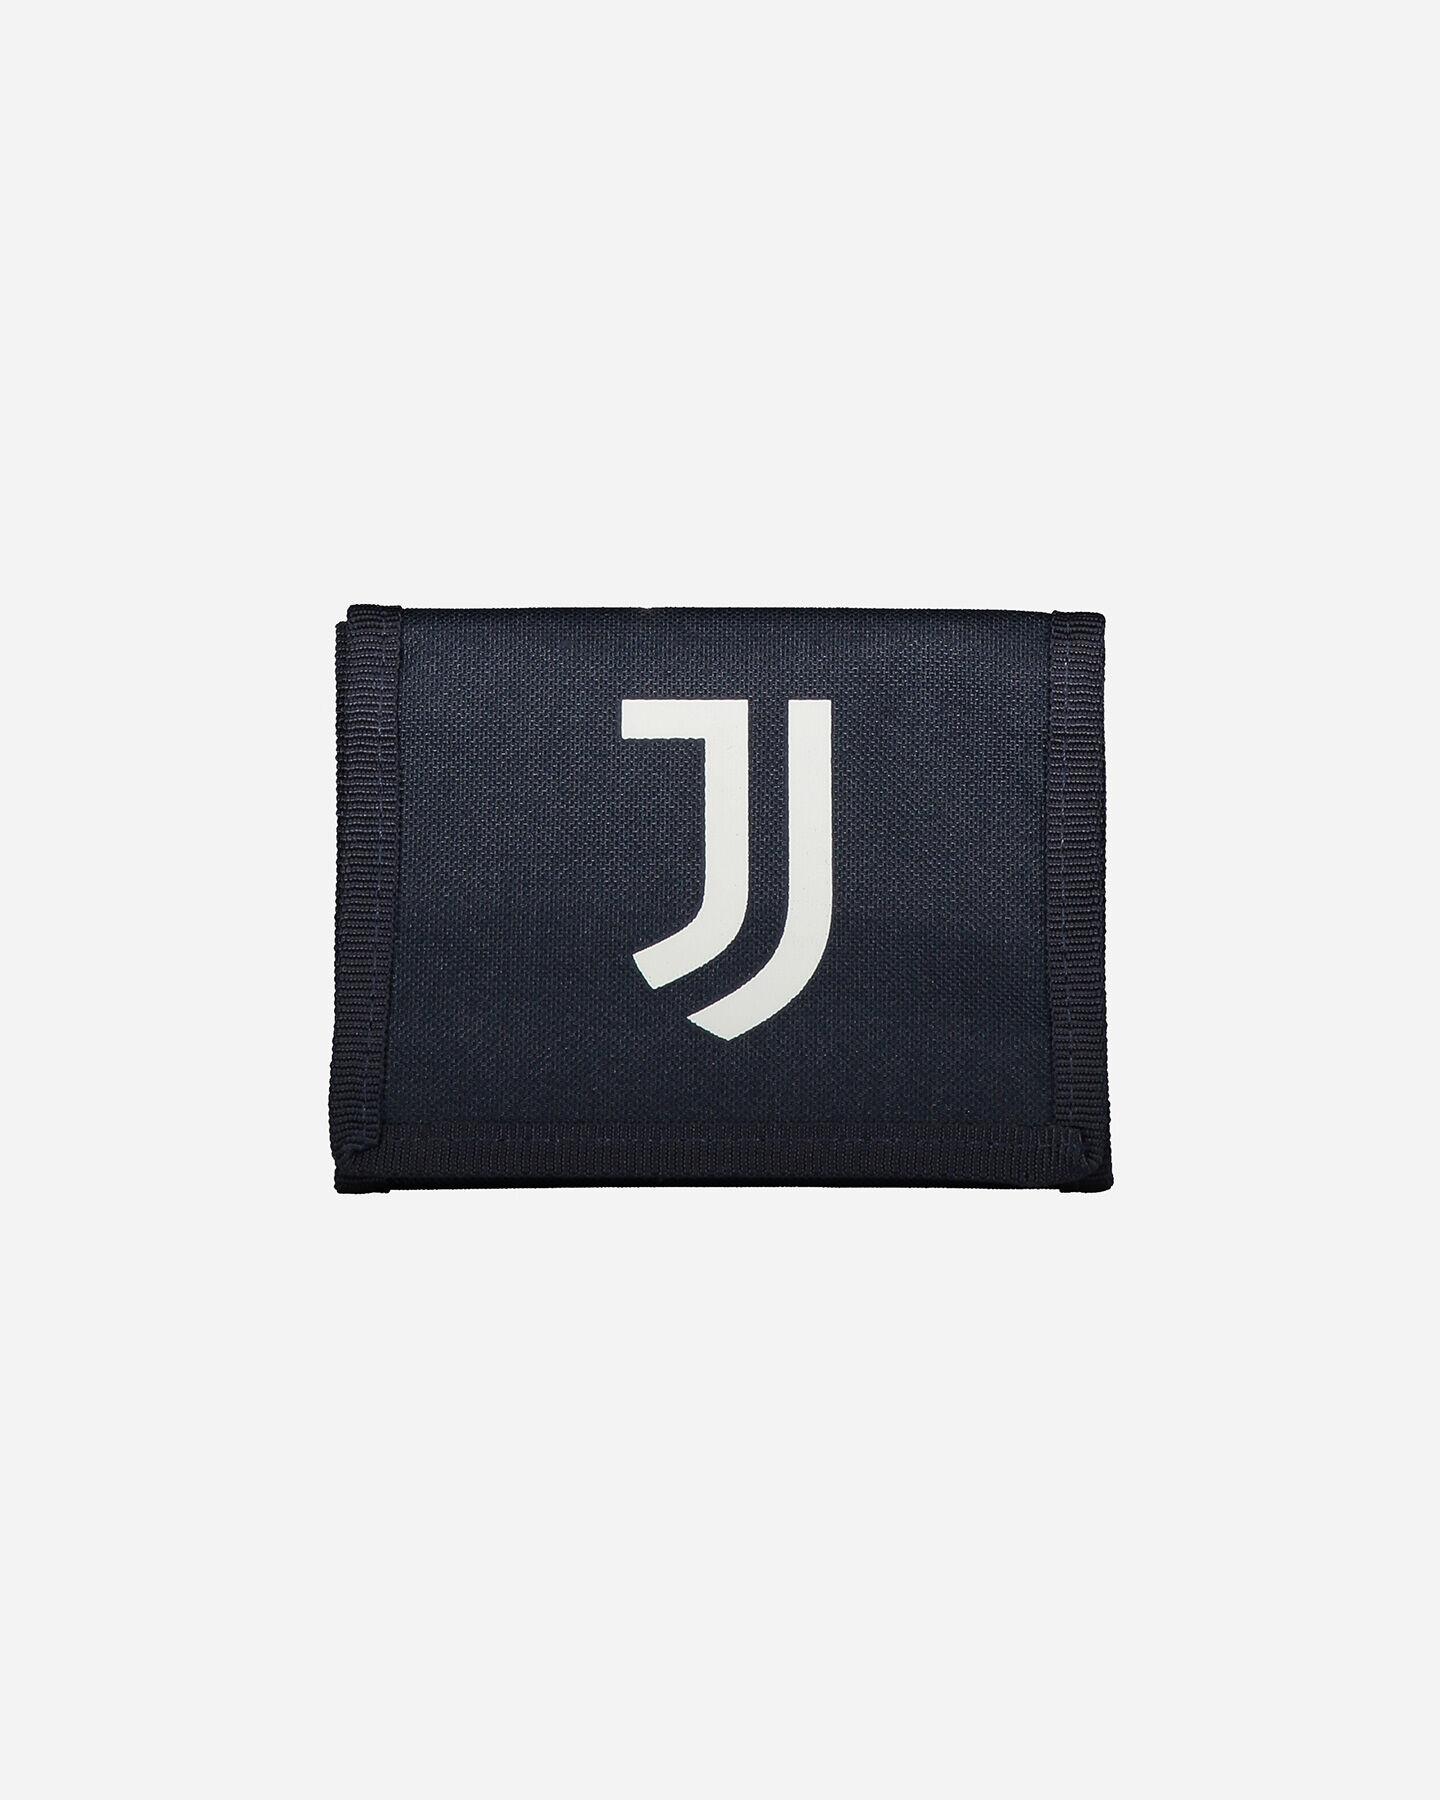 Accessorio calcio ADIDAS JUVENTUS M S5217695 UNI NS scatto 0